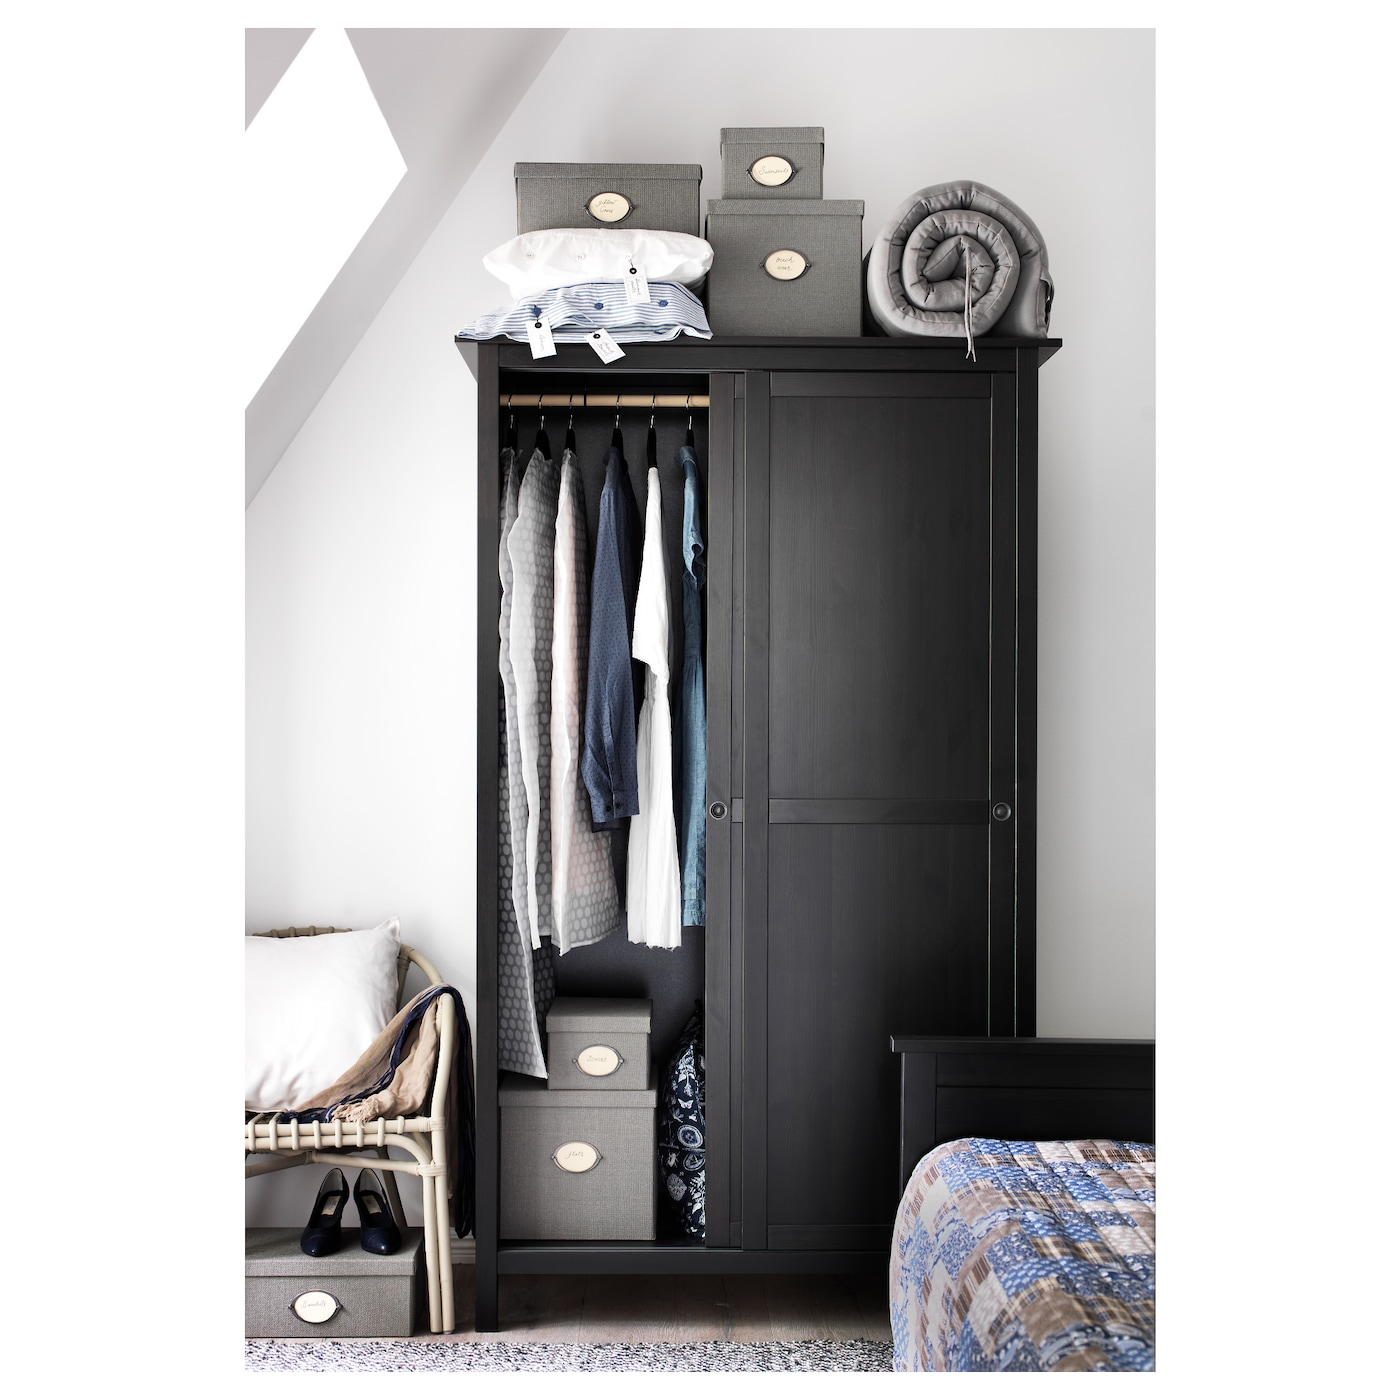 Hemnes Wardrobe With 2 Sliding Doors Black Brown 47 1 4x77 1 2 Ikea